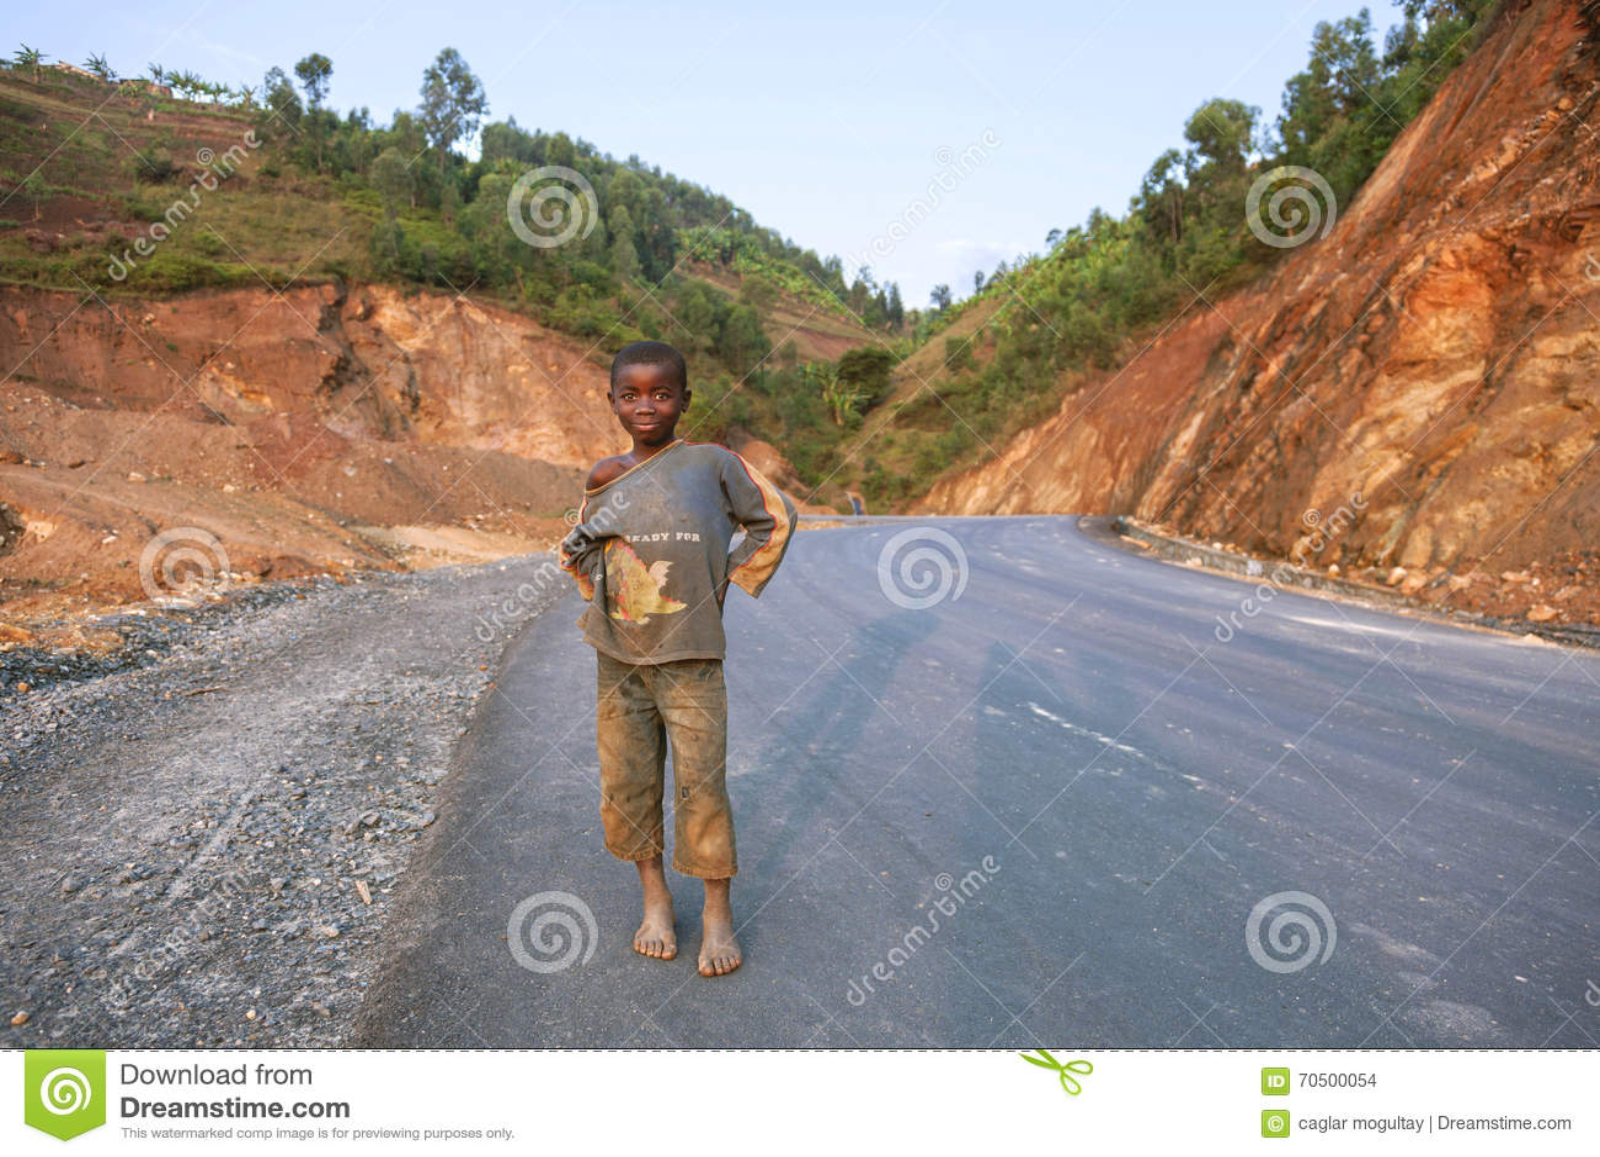 Children nude on camera KIGALI, RWANDA - SEPTEMBER 6, 2015: Unidentified child. A child on the